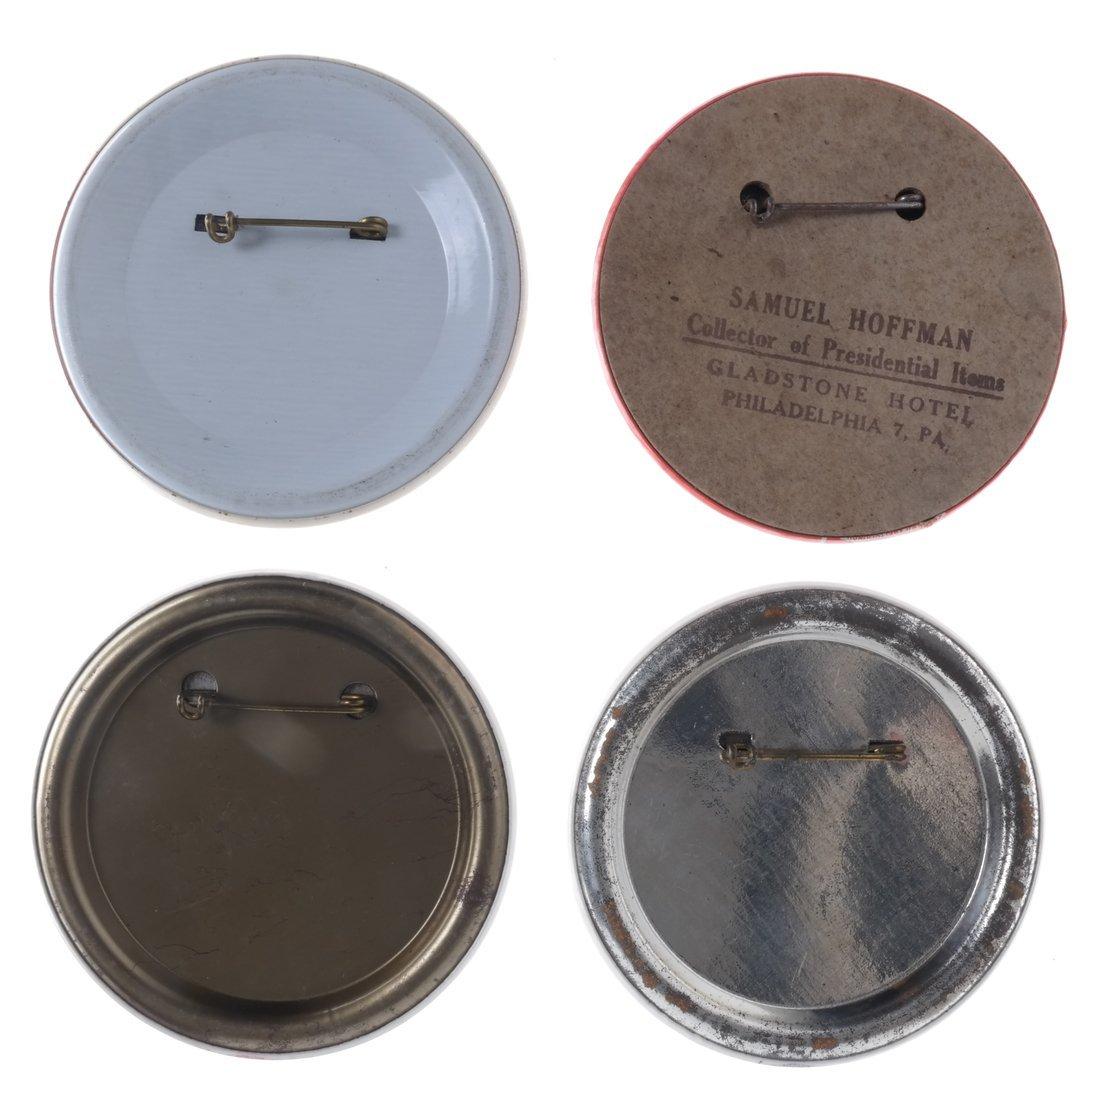 FDR & Dewey - Four 1944 Buttons - 2